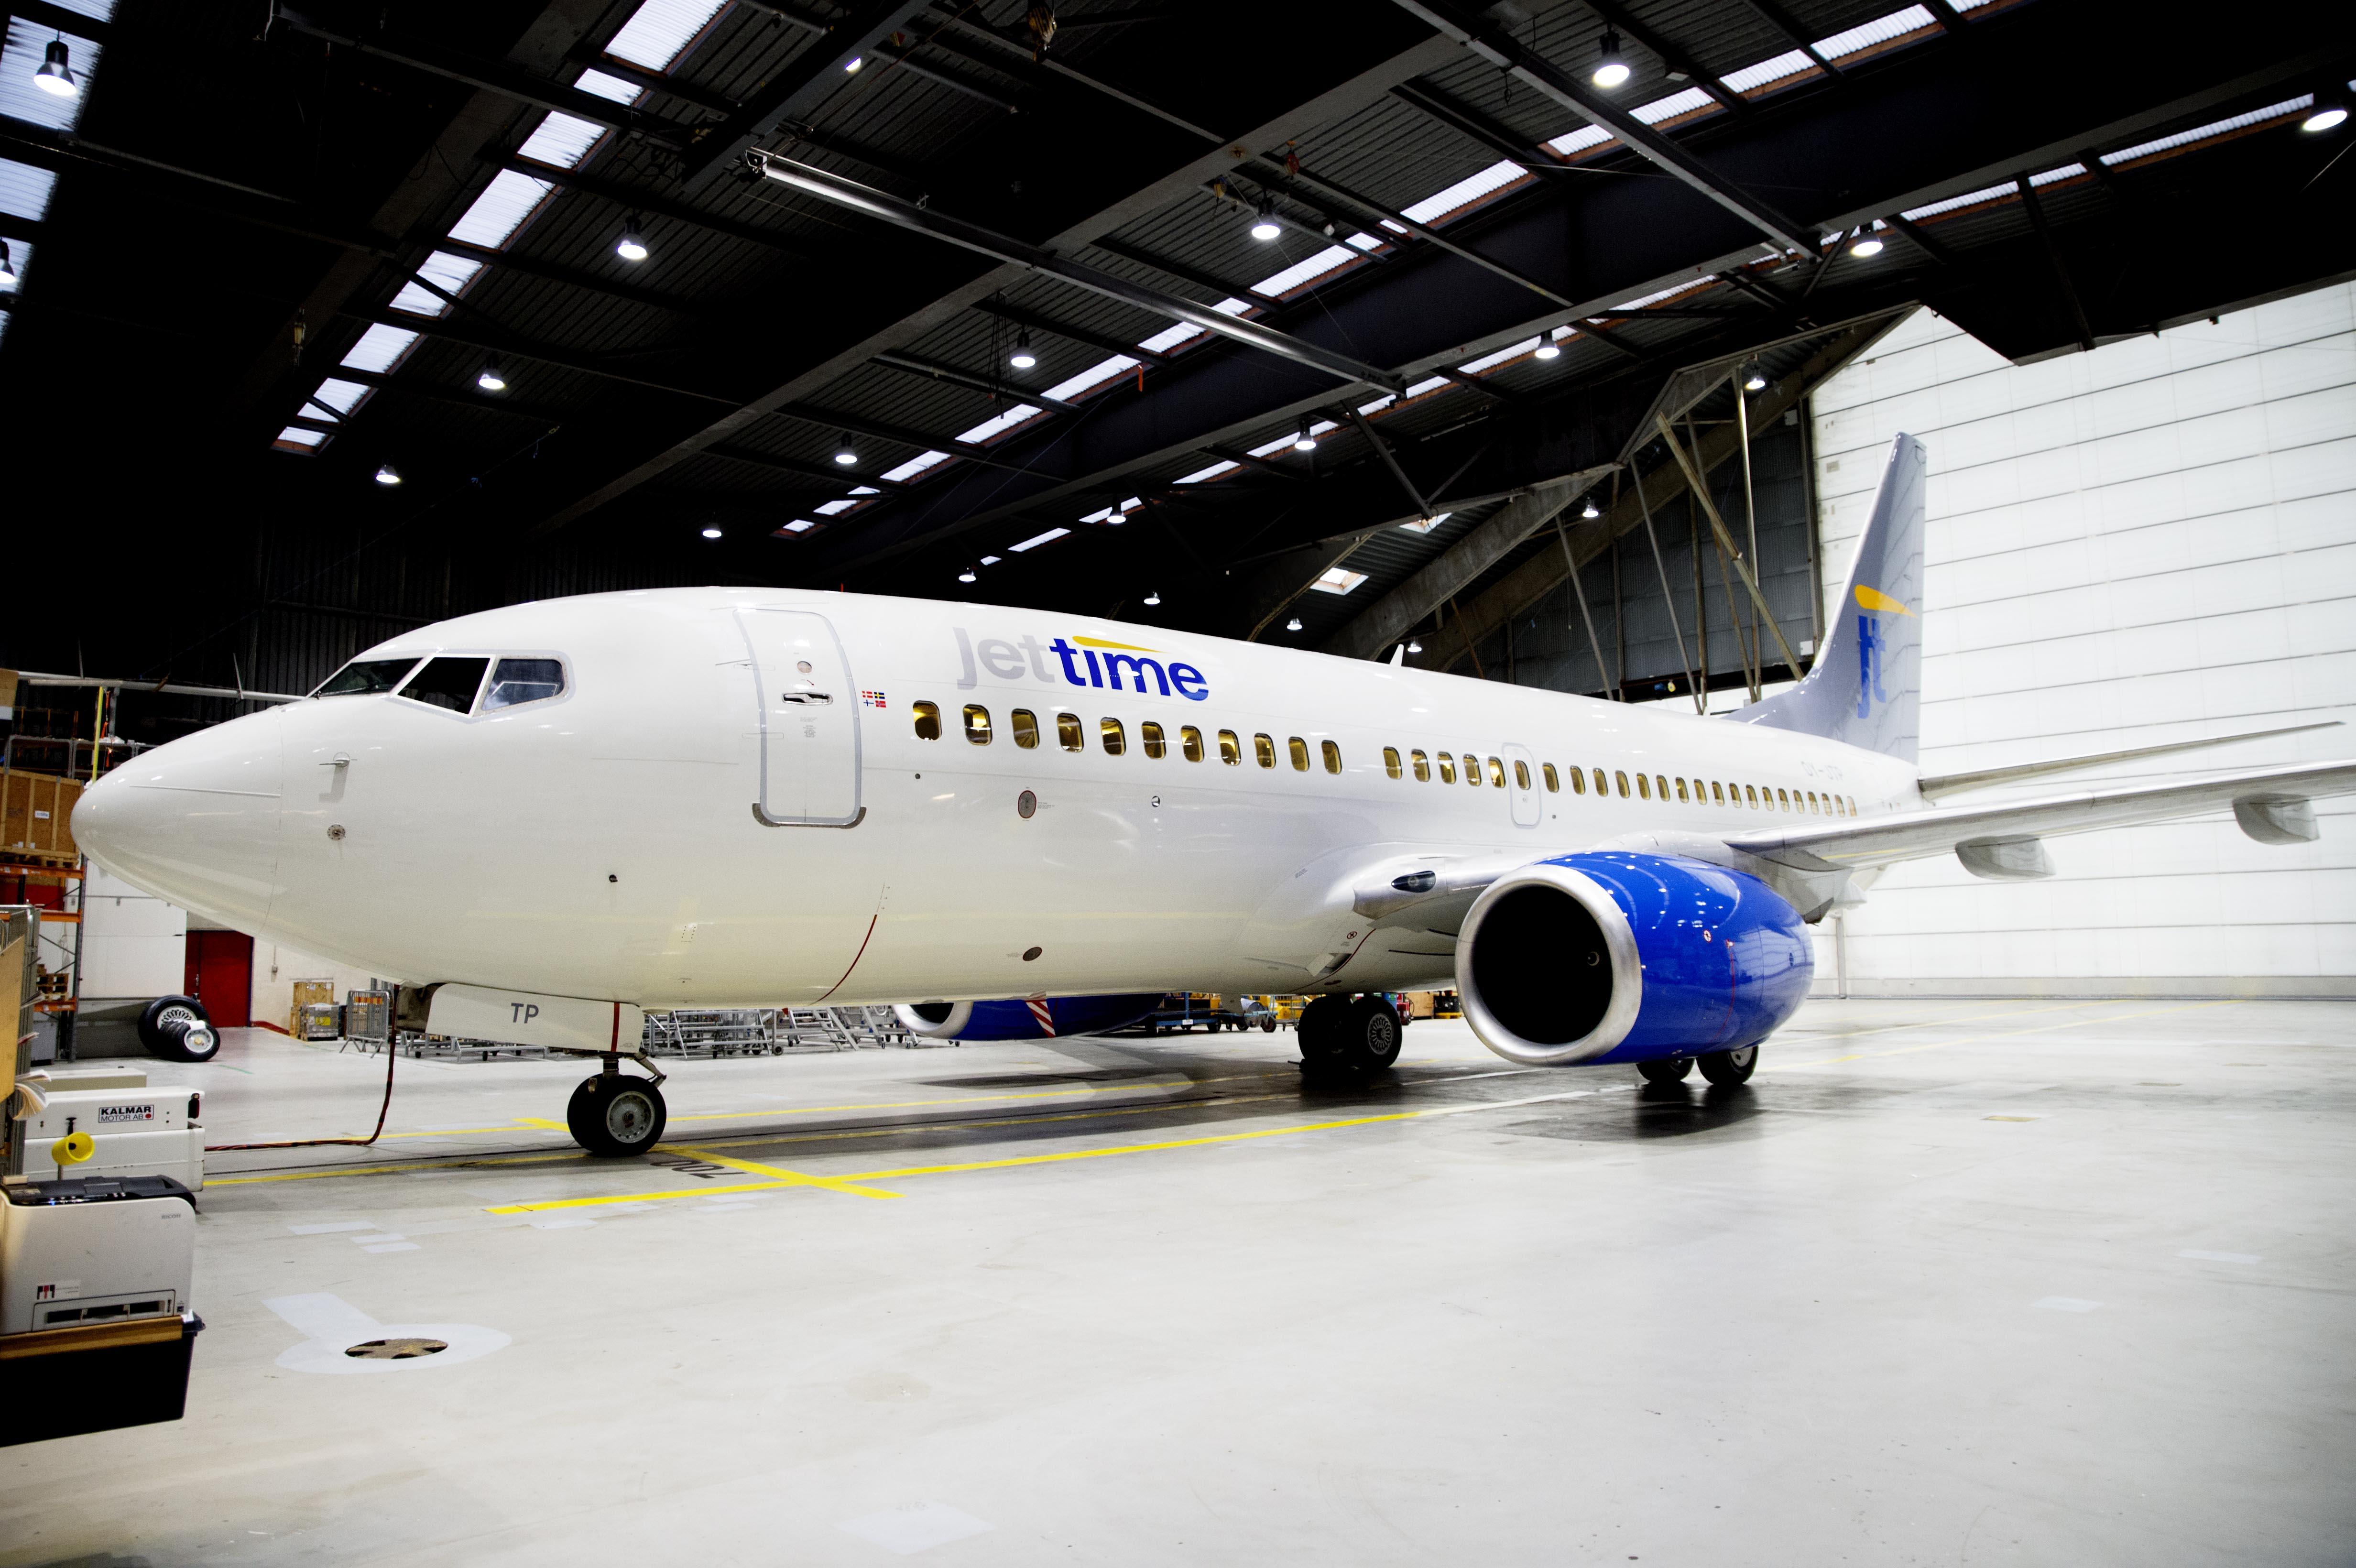 Jet Time Boeing 737-700 – OY-JTP (Foto: Erik Refner)